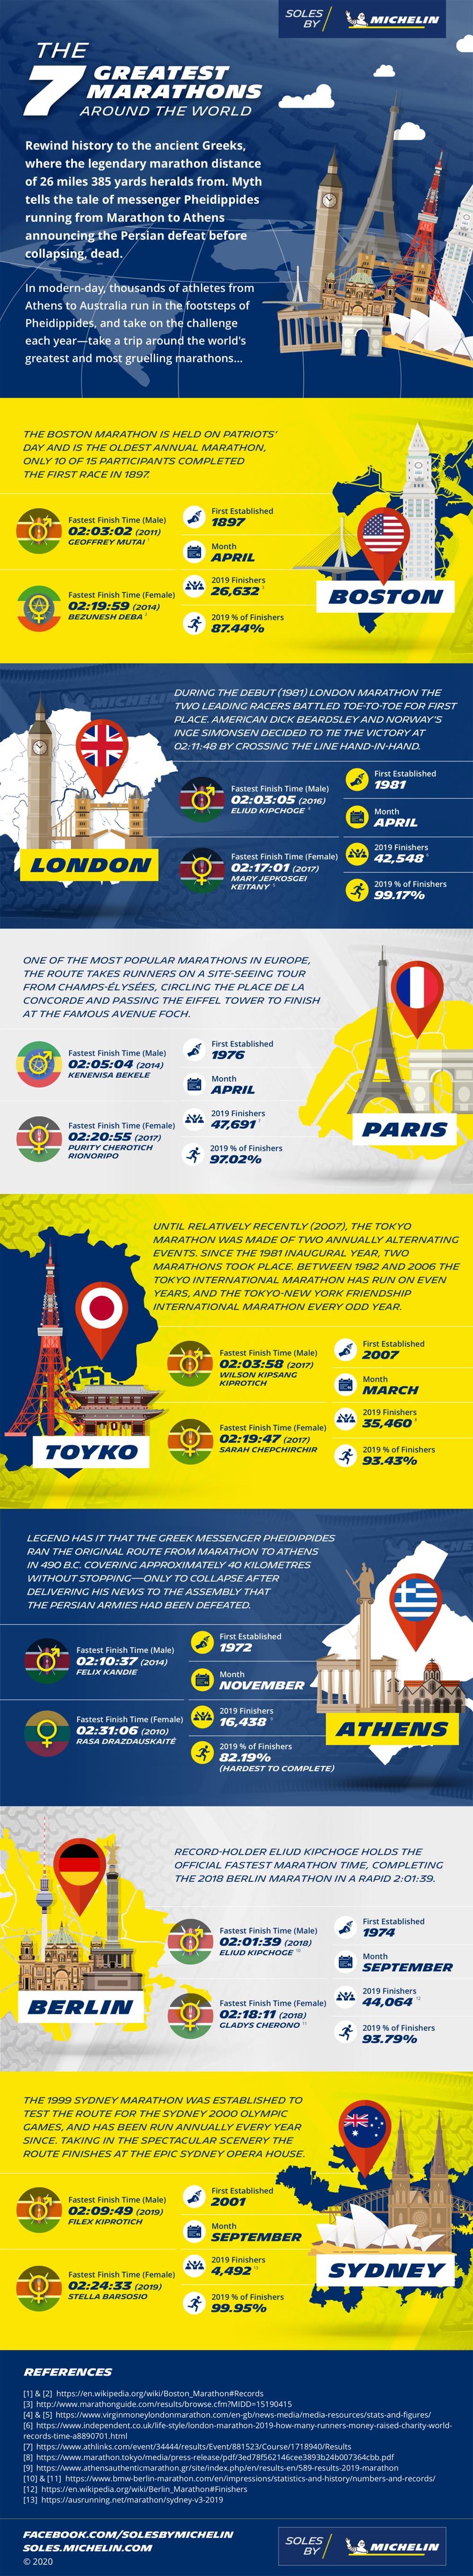 7 Great Marathons From Around The World